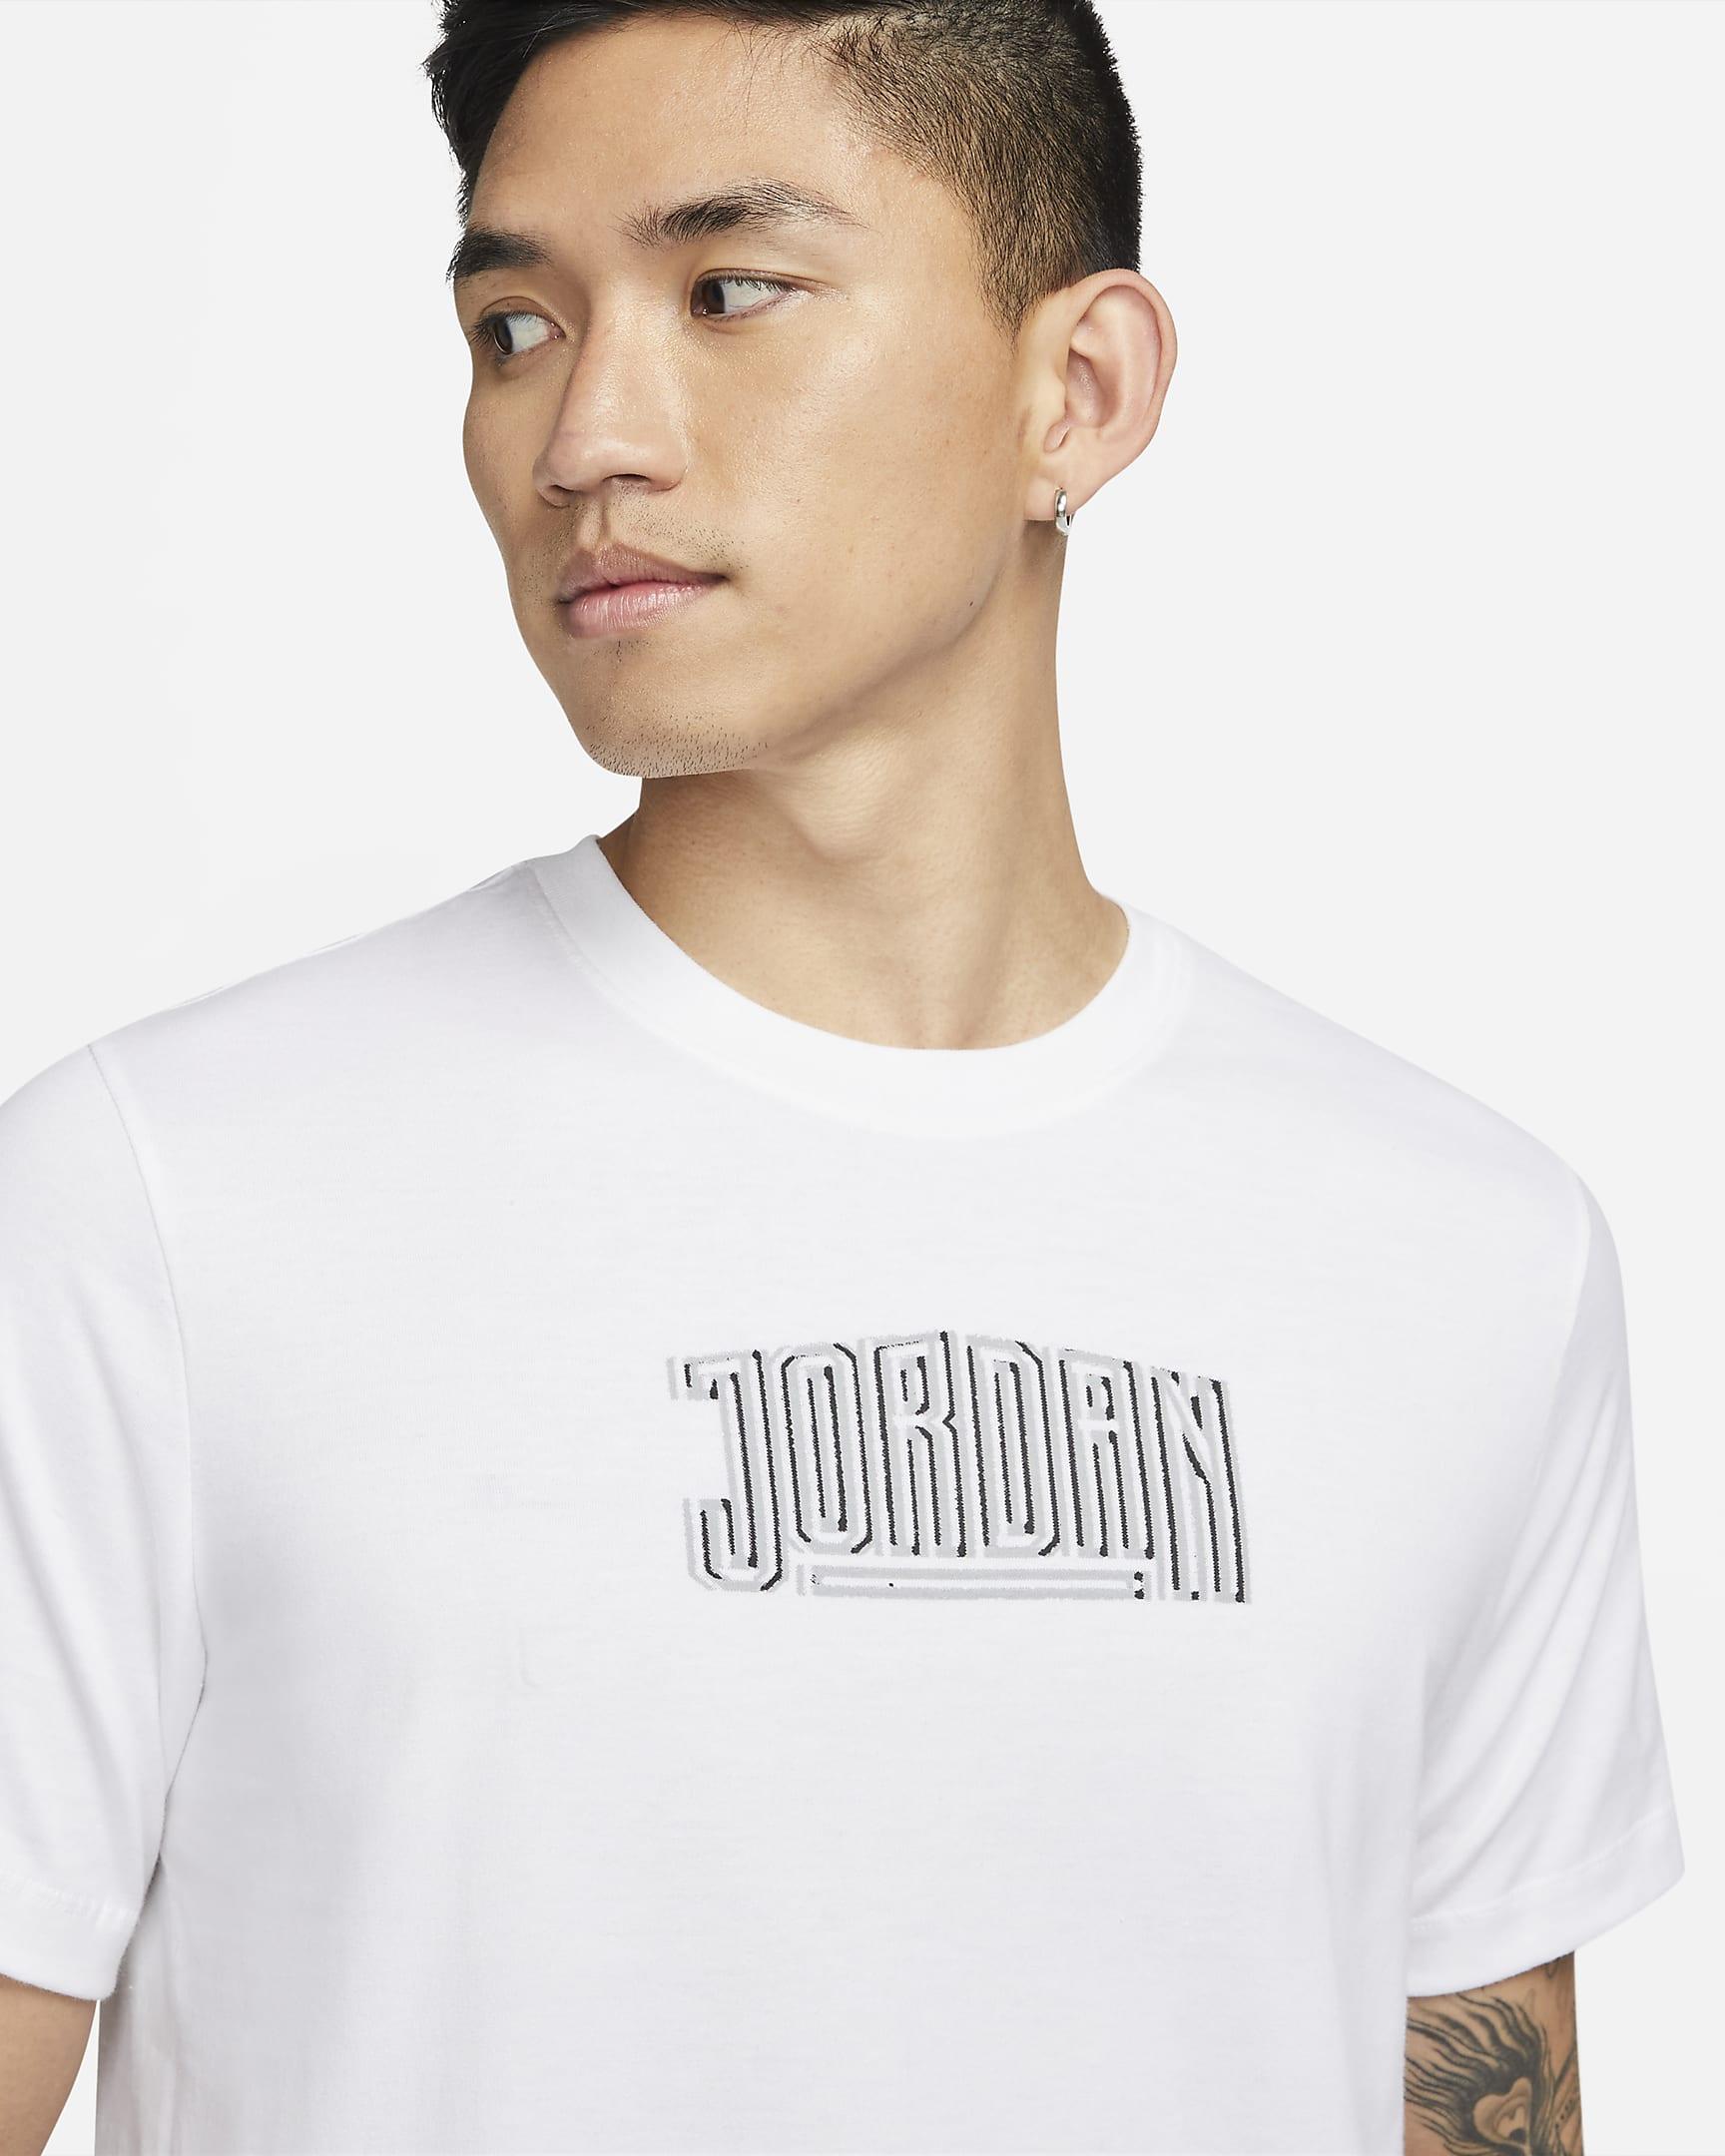 jordan-sport-dna-mens-short-sleeve-t-shirt-5dQJlz-2.png